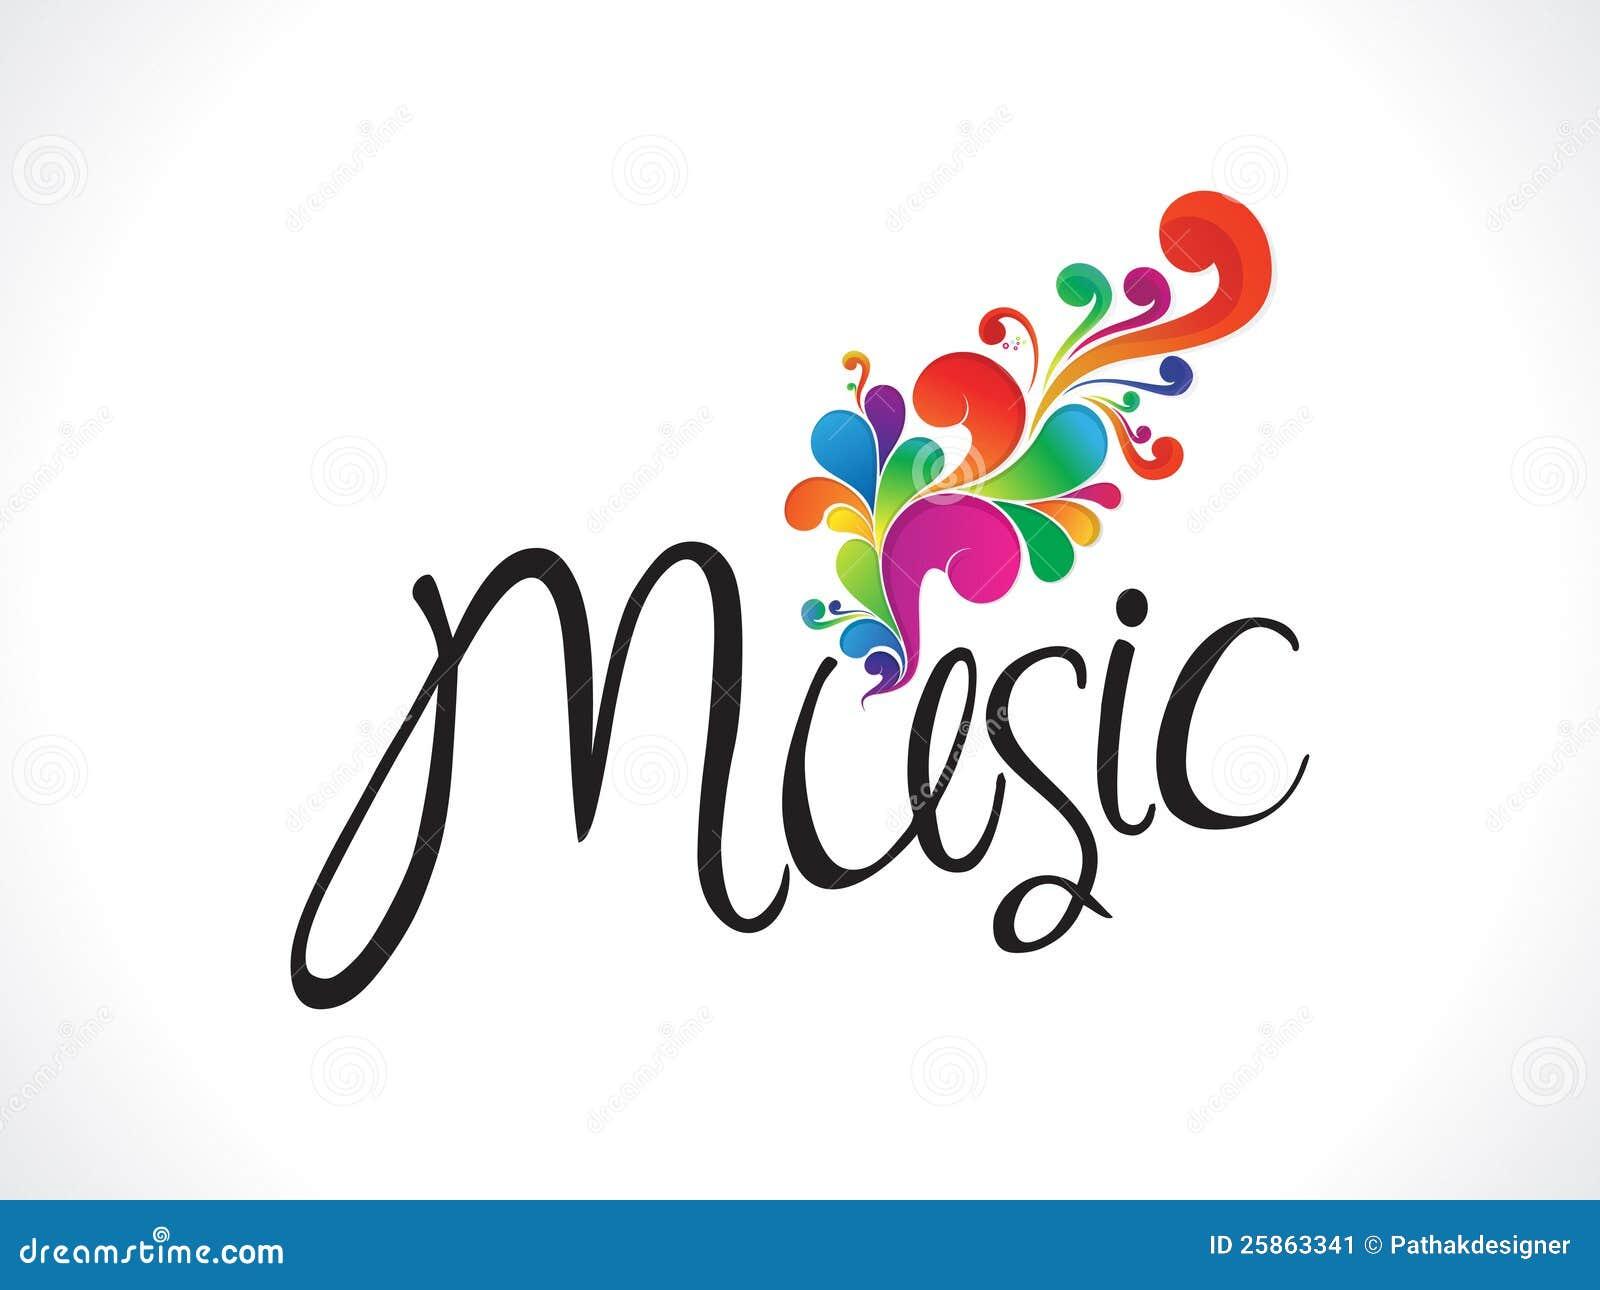 musictext music text pendulum - photo #2